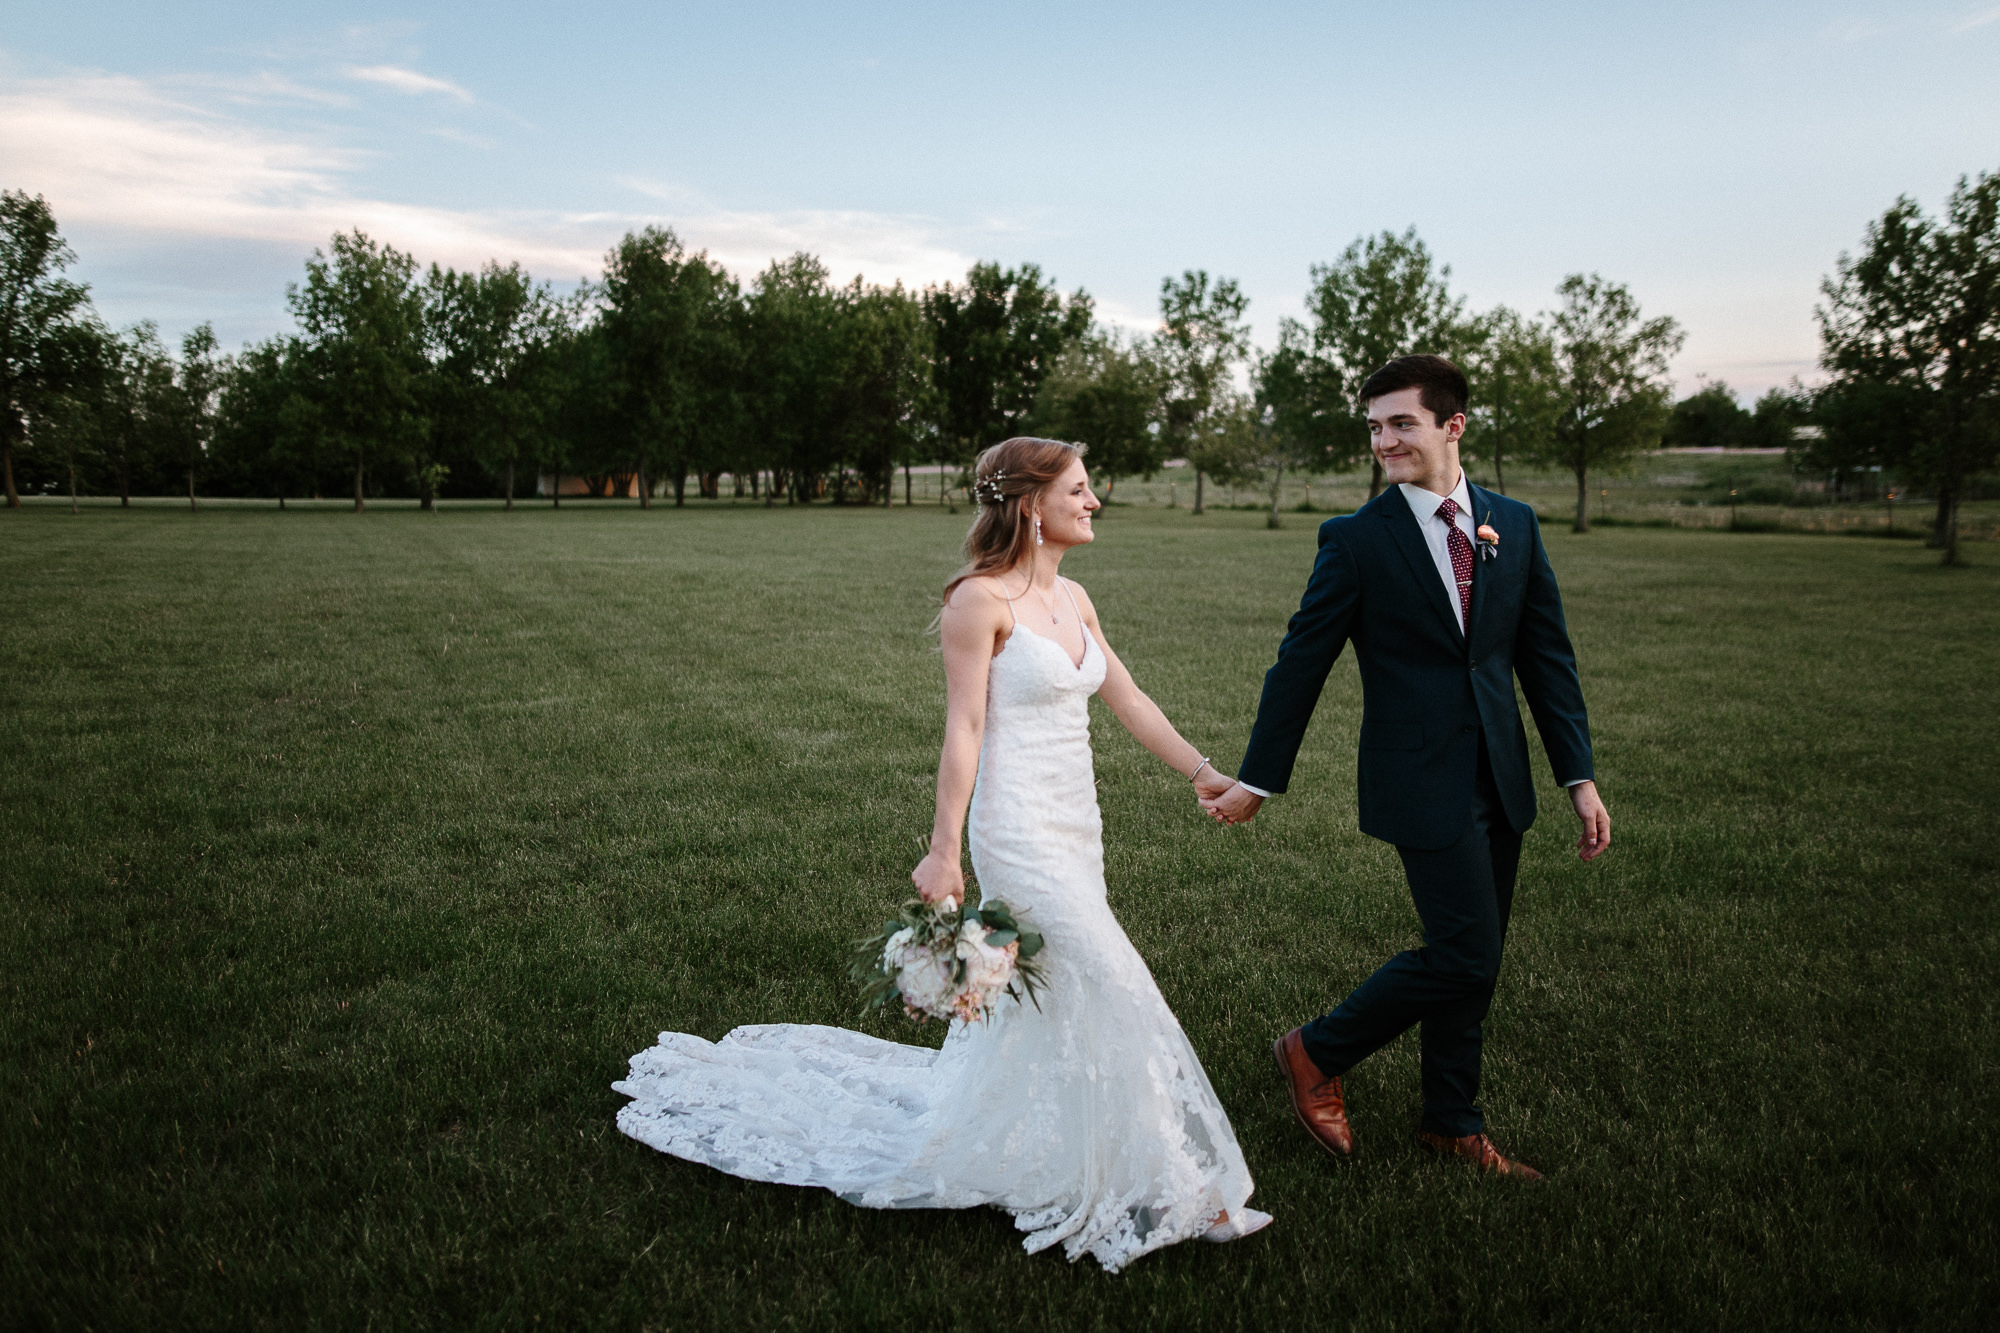 wedding-elopement-adventerous-romantic-timeless-south-dakota-blue-haven-barn-092.jpg